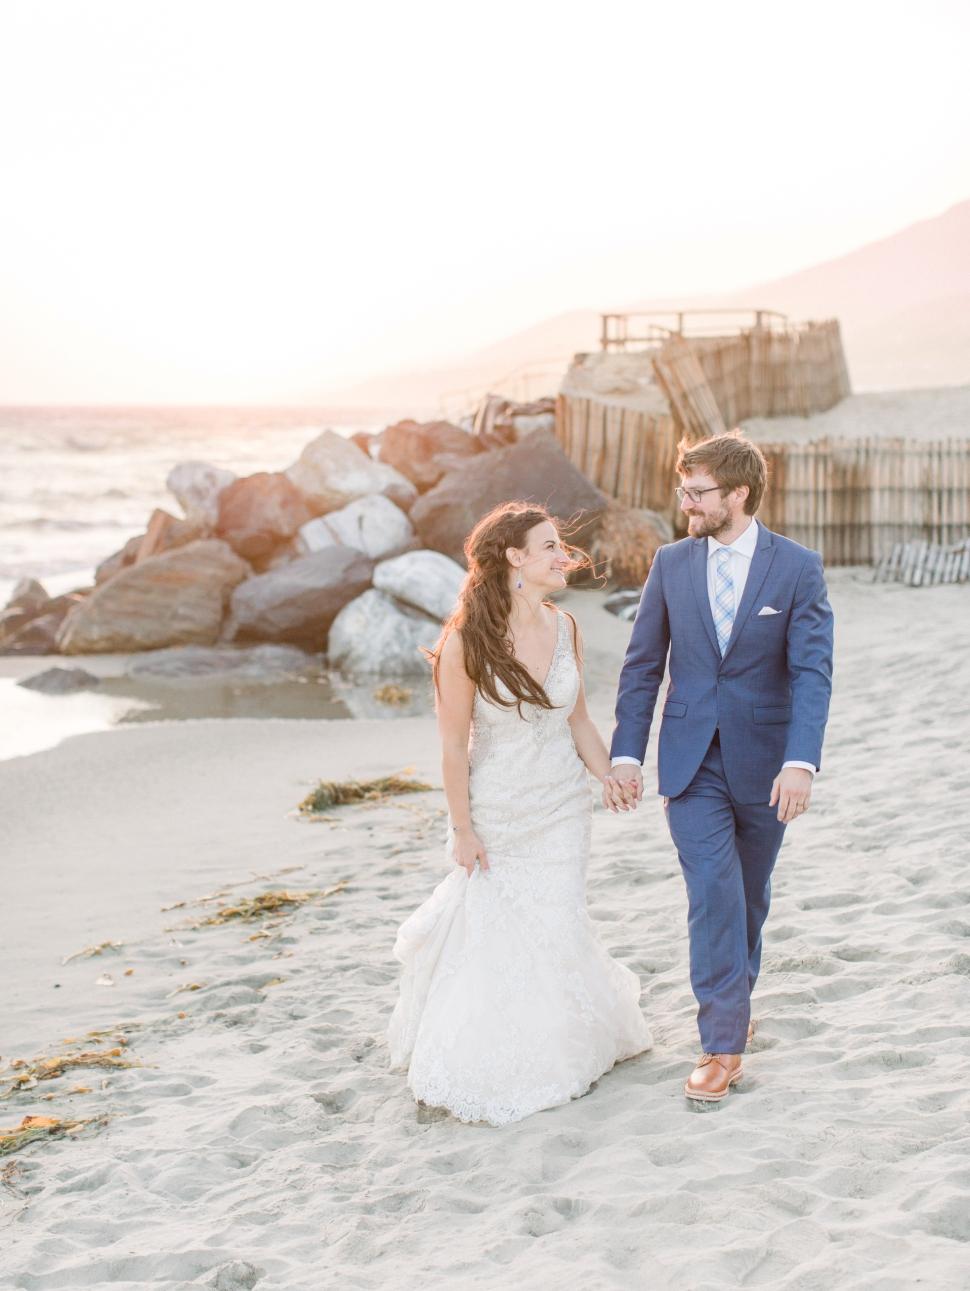 Malibu-Wedding-Photographer-Cassi-Claire-Malibu-West-Beach-Club-Wedding_17.jpg